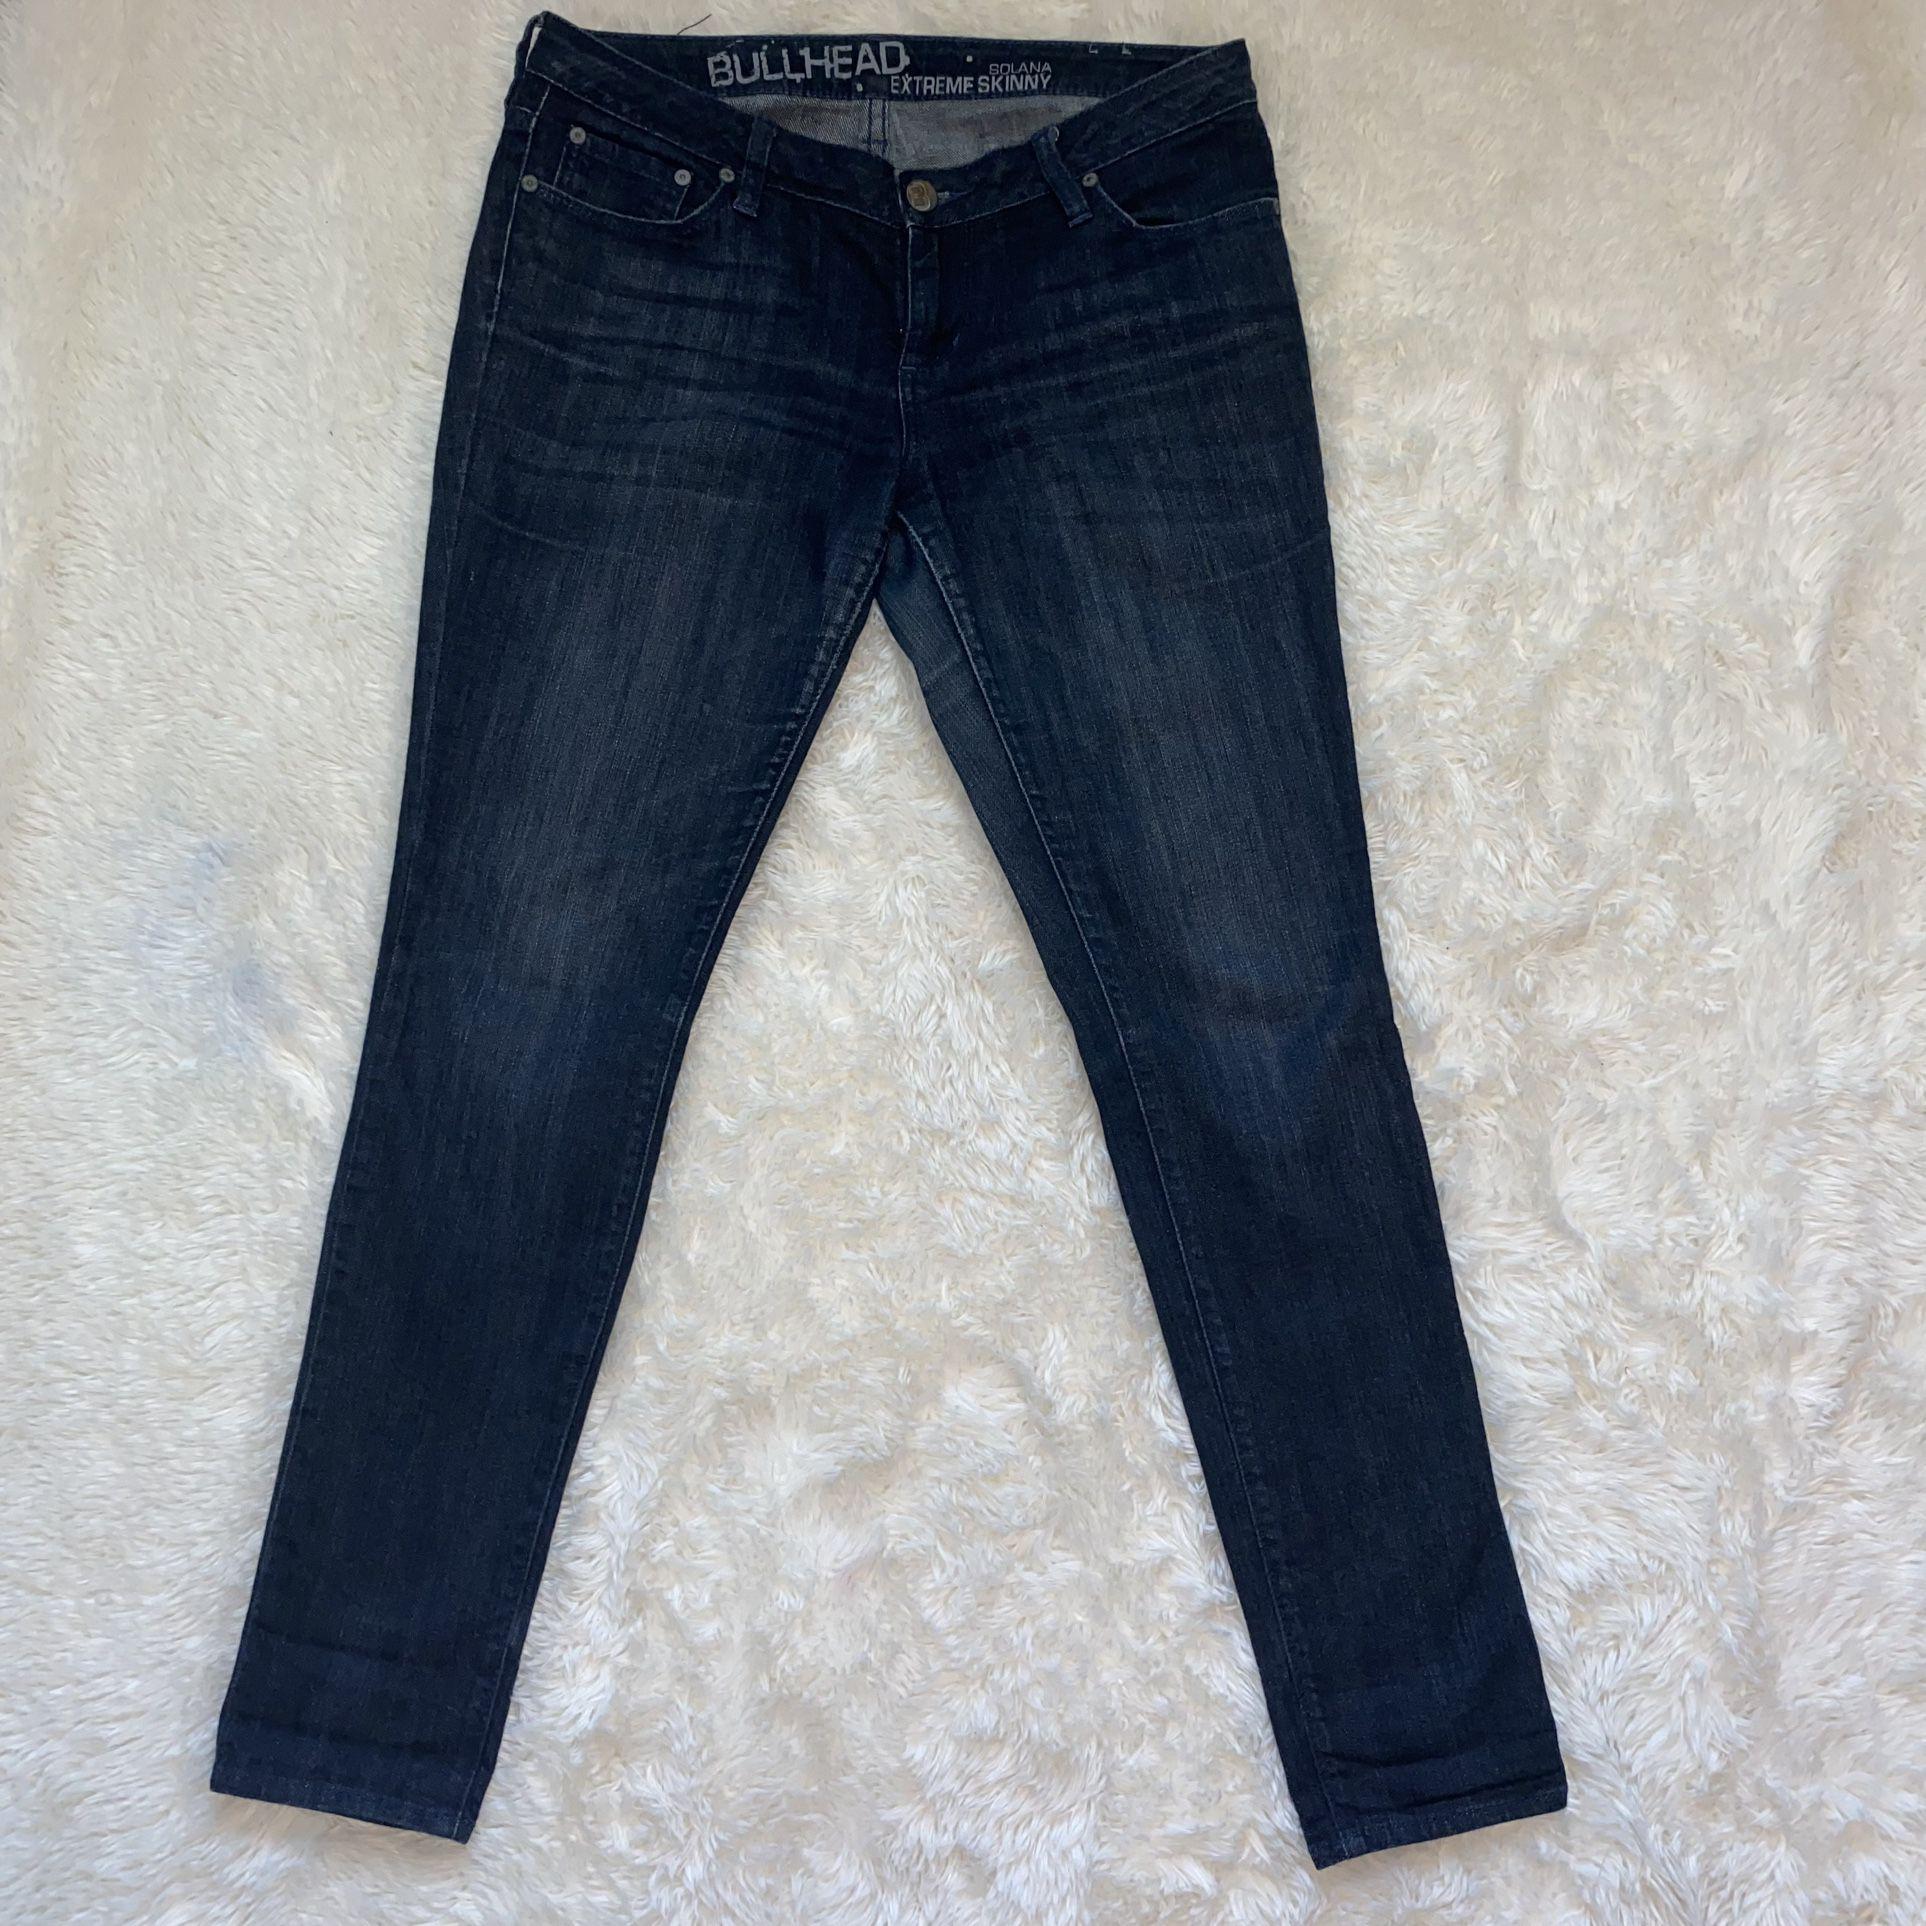 Bullhead Solana Extreme Skinny 9R Dark Blue Jeans